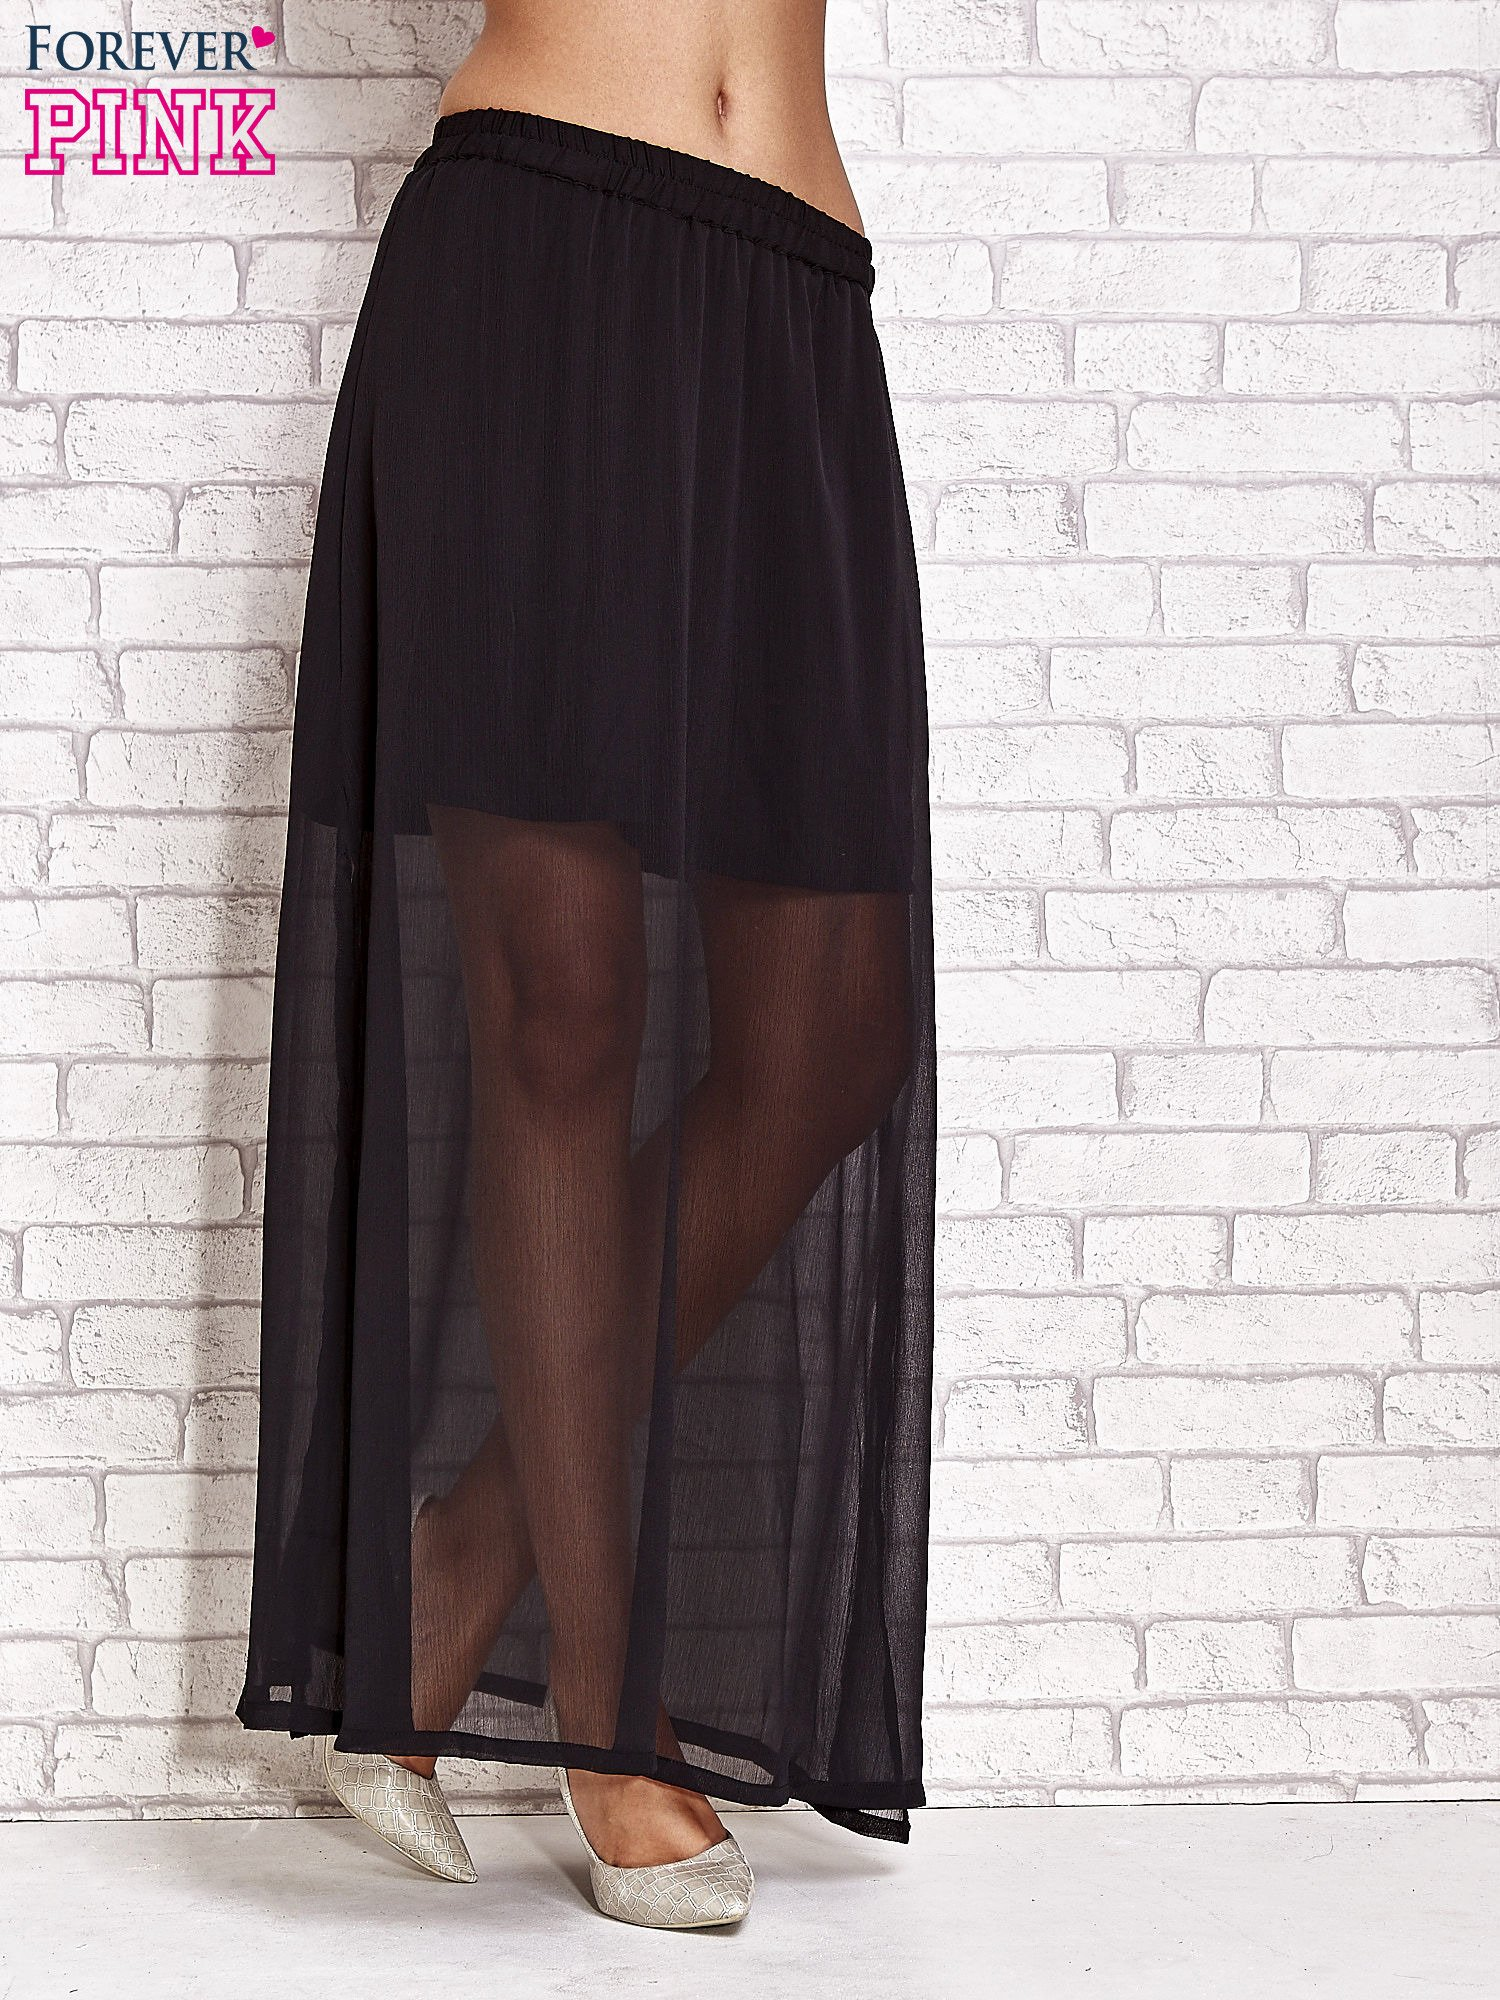 Czarna transparentna spódnica maxi                                  zdj.                                  1